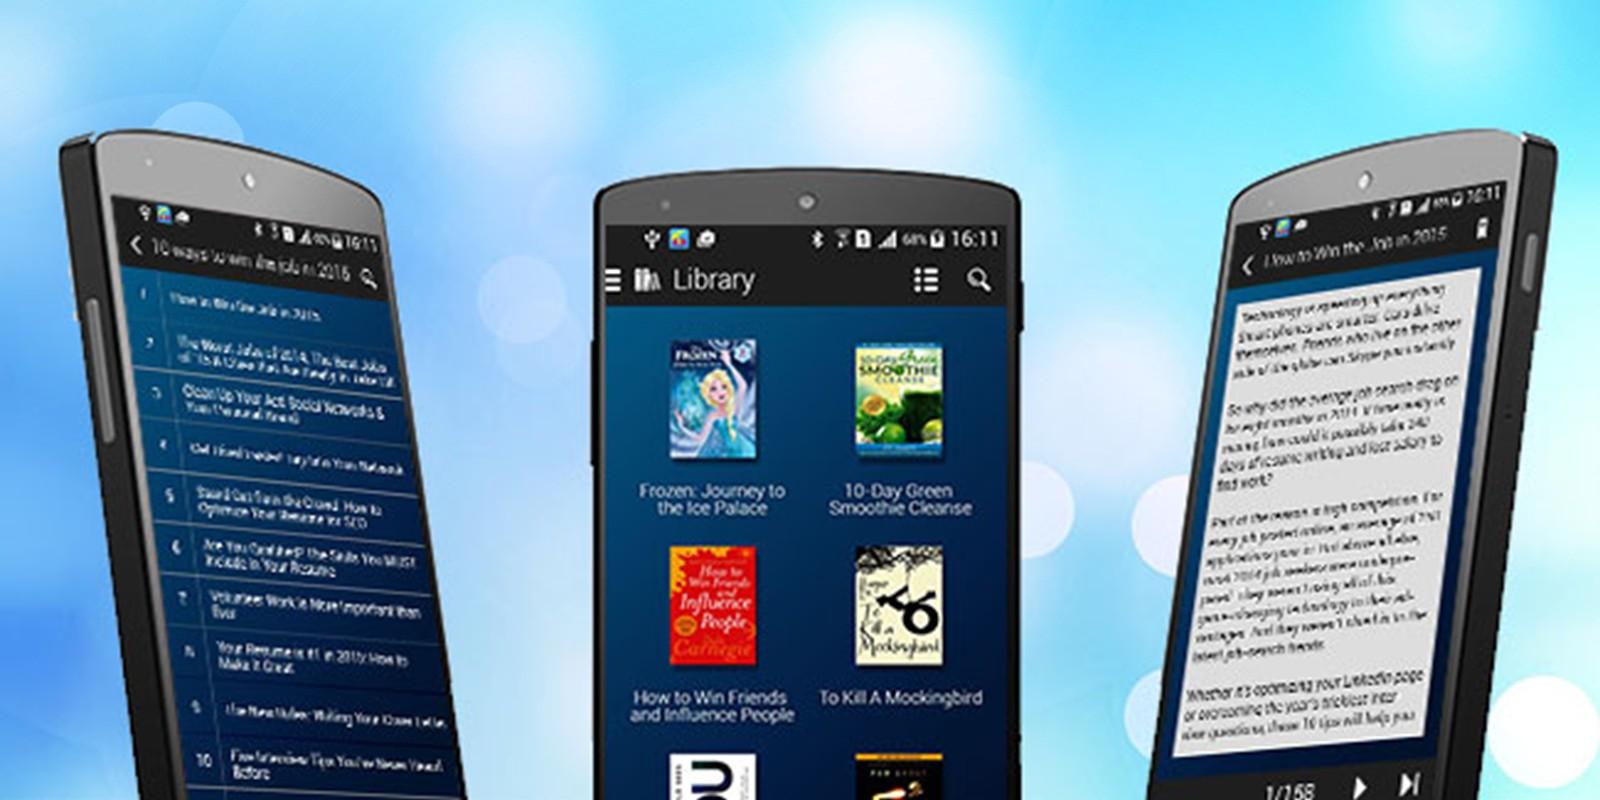 ebook library ios app template miscellaneous app templates for